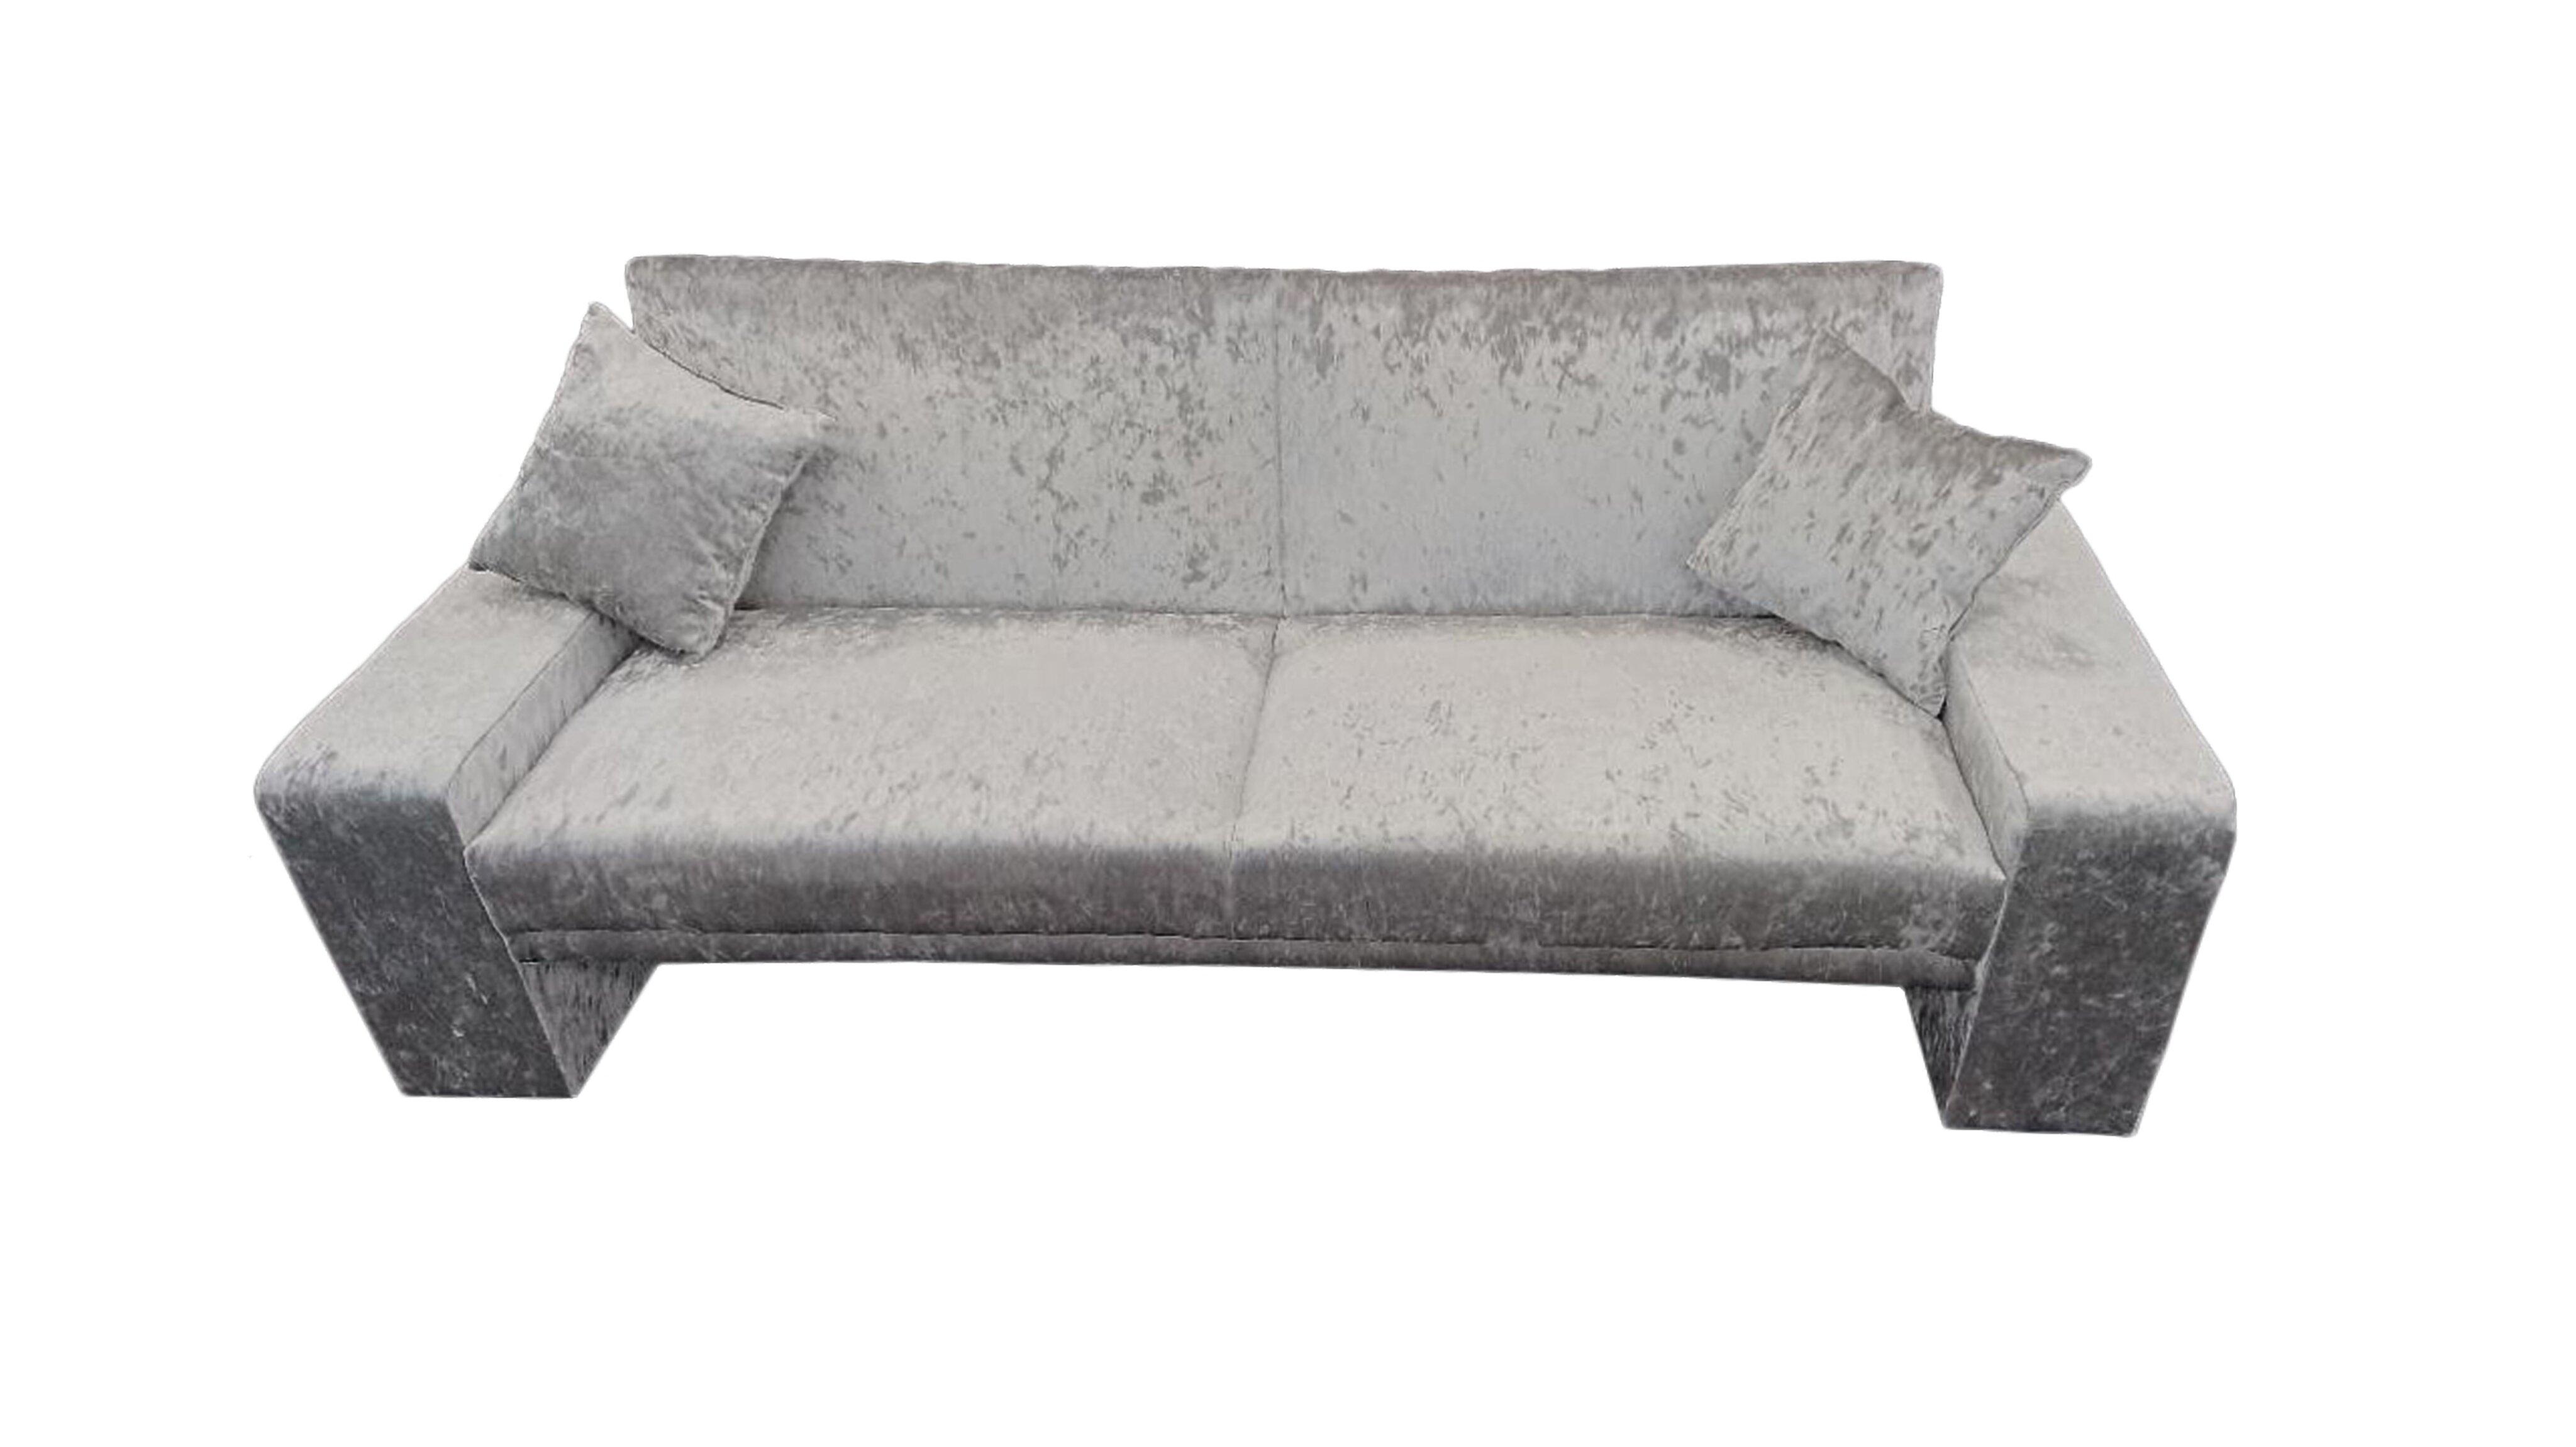 Sensational Shamar 3 Seater Clic Clac Sofa Bed Pdpeps Interior Chair Design Pdpepsorg